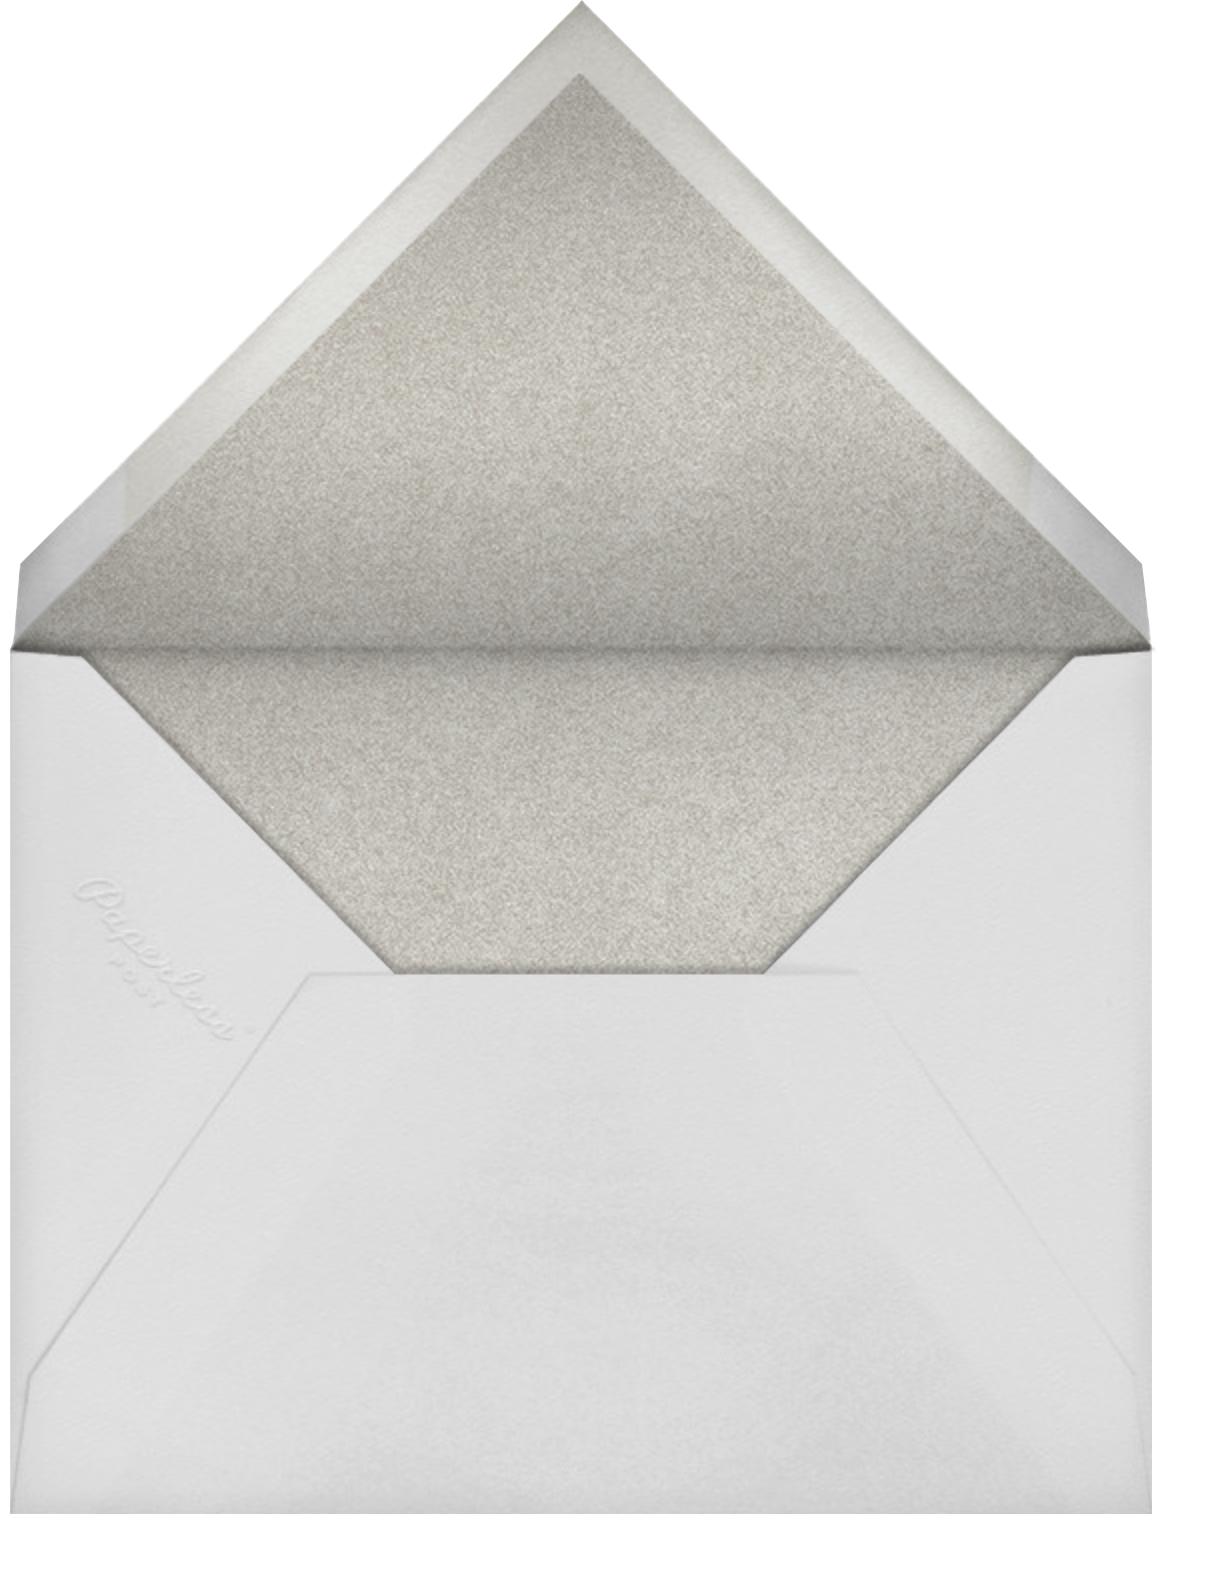 Floral Pinstripe - Pewter Gray - Vera Wang - All - envelope back